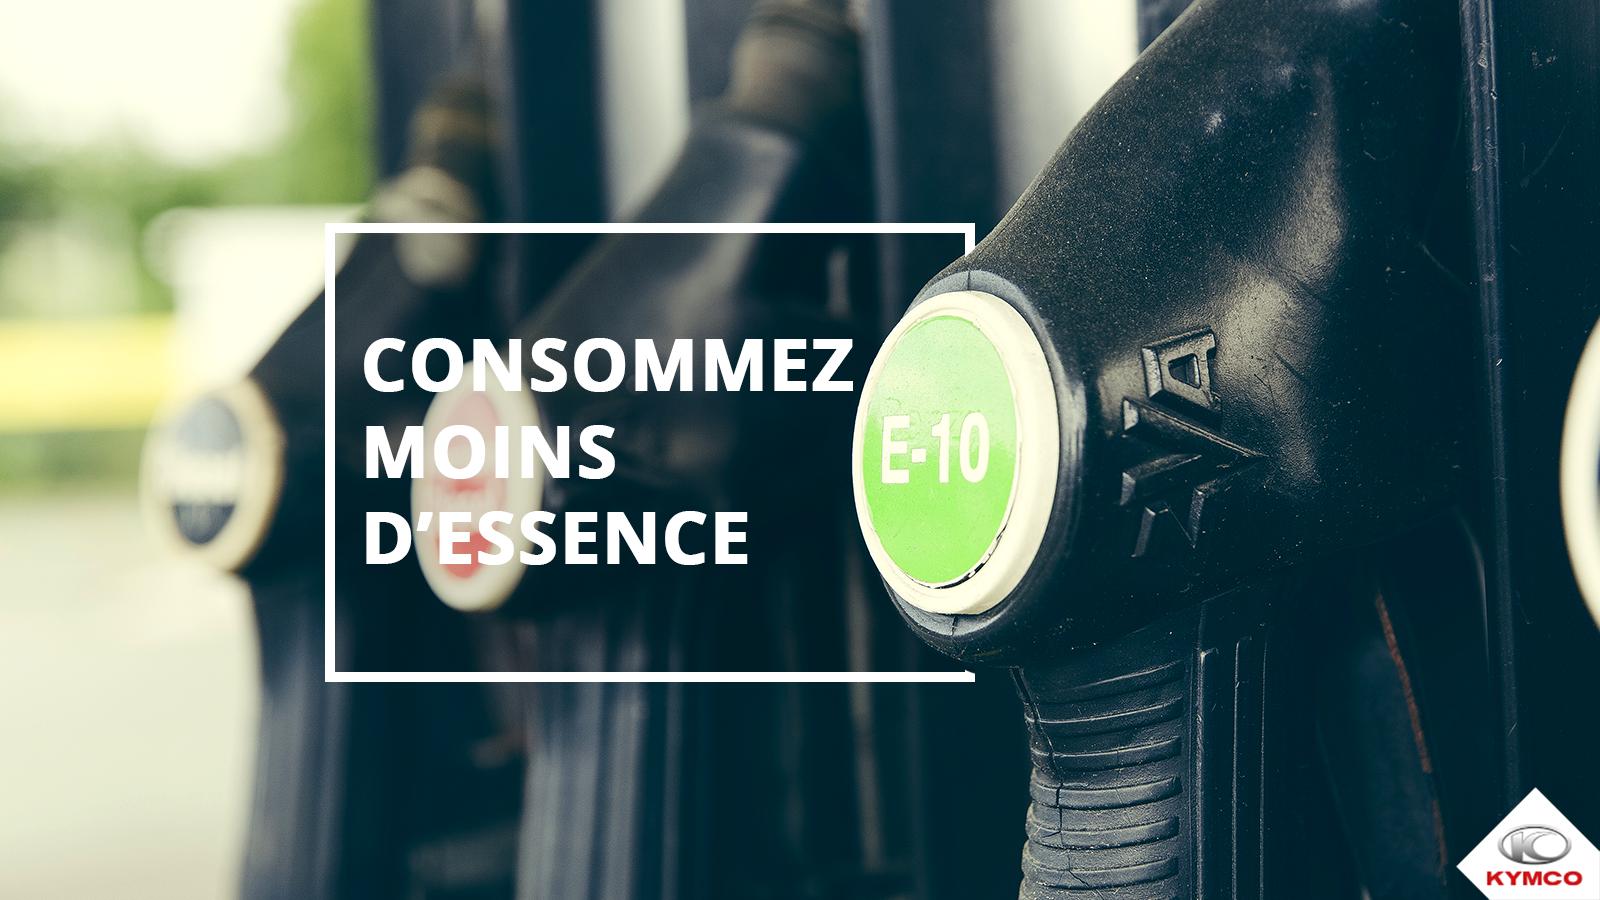 Consommez-moins-essence_featured